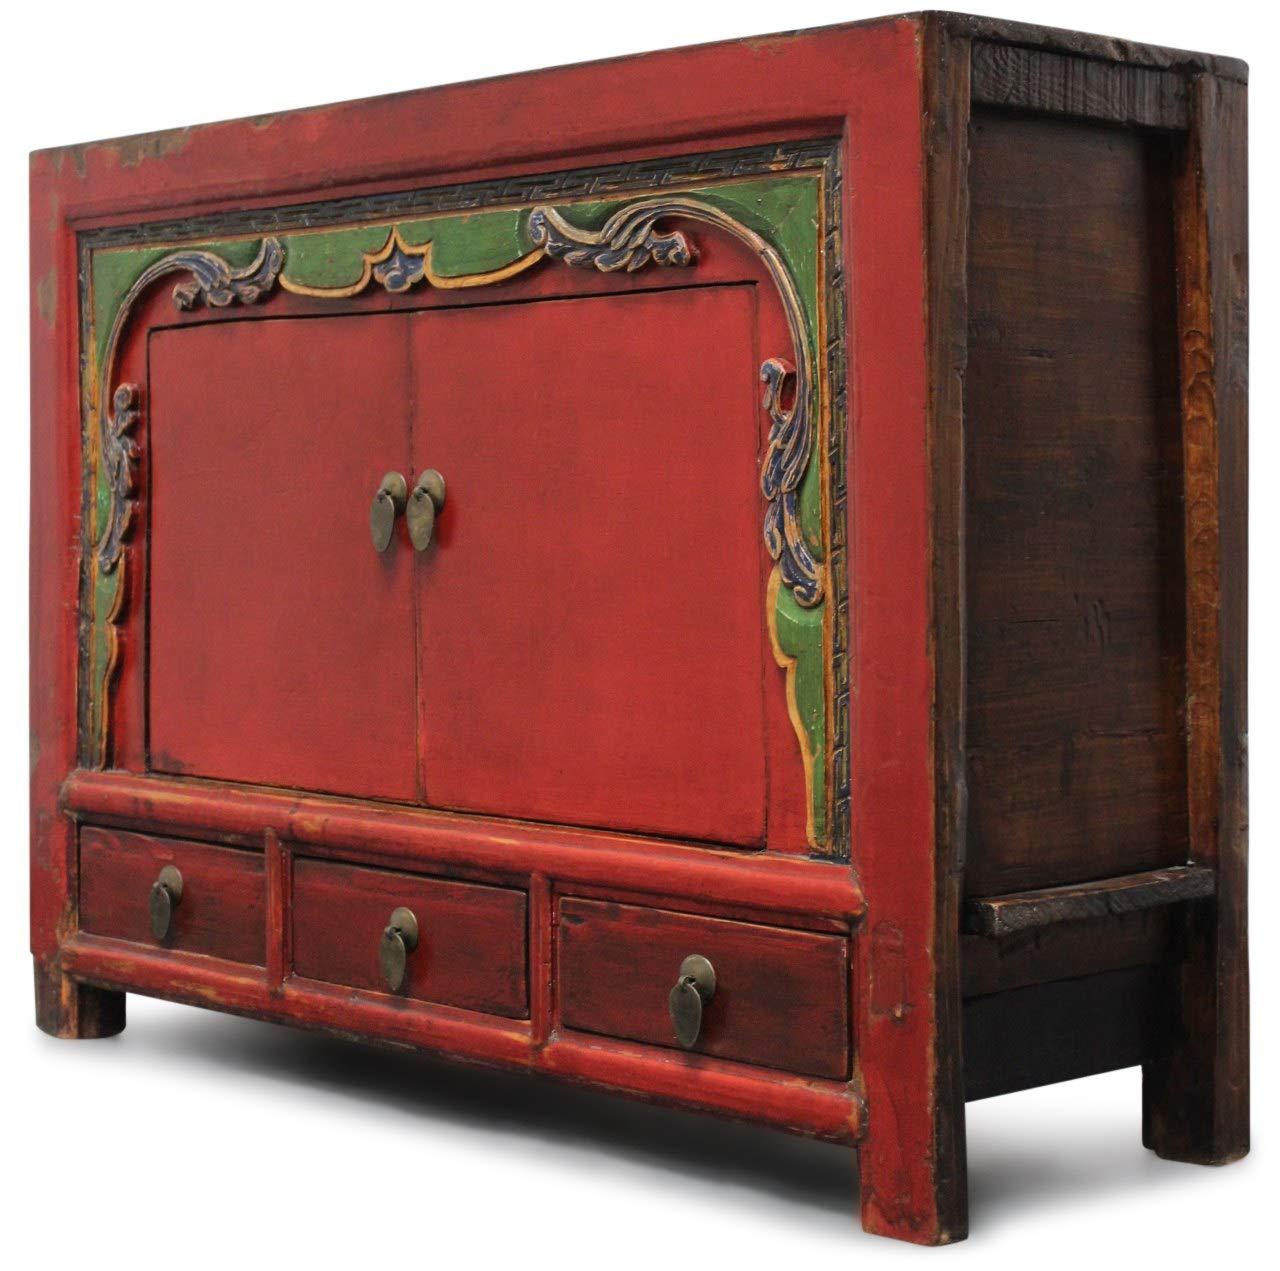 Asien Lifestyle asiáticas - Cómoda (40 x 121 x 88 cm) en ...